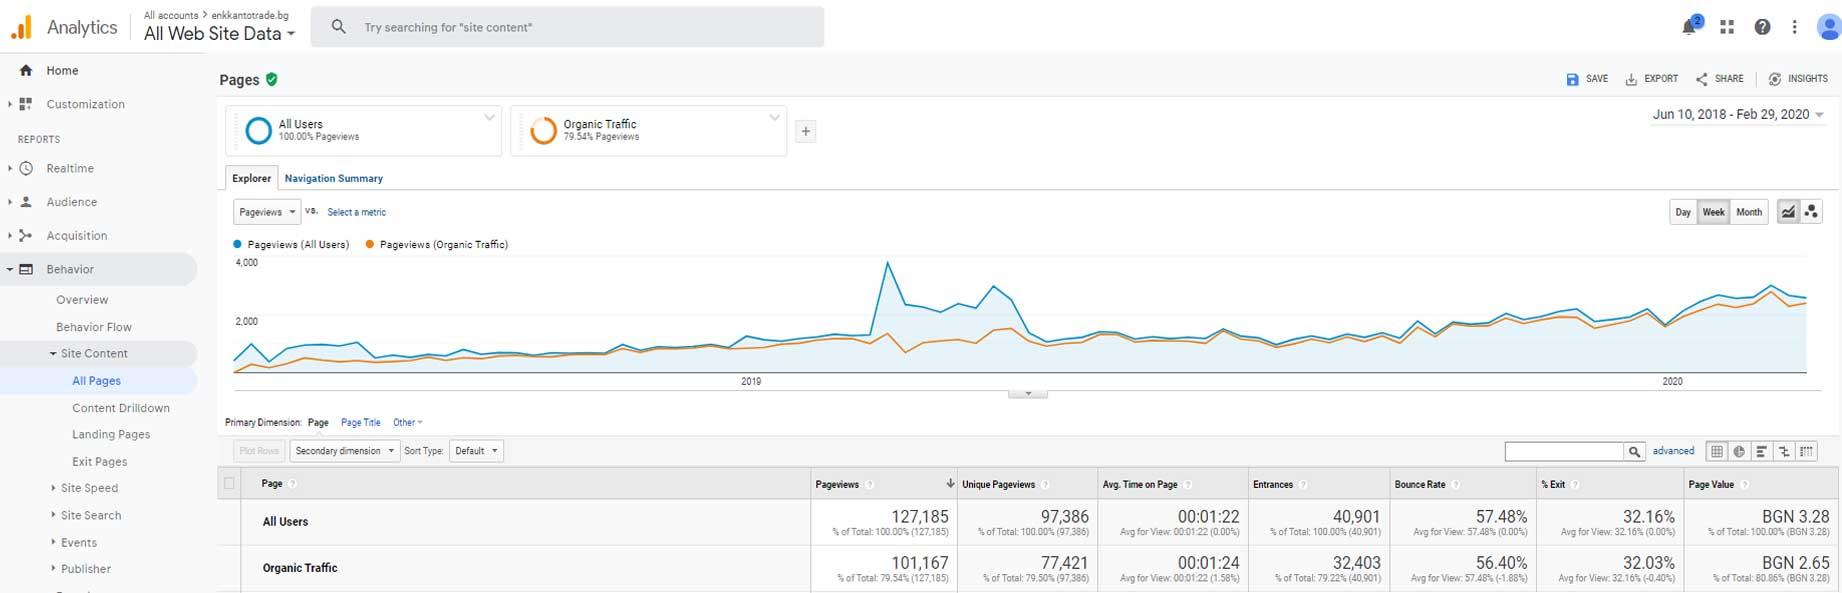 SEO marketing research: Ανοιγμα σελίδων ιστοσελίδας